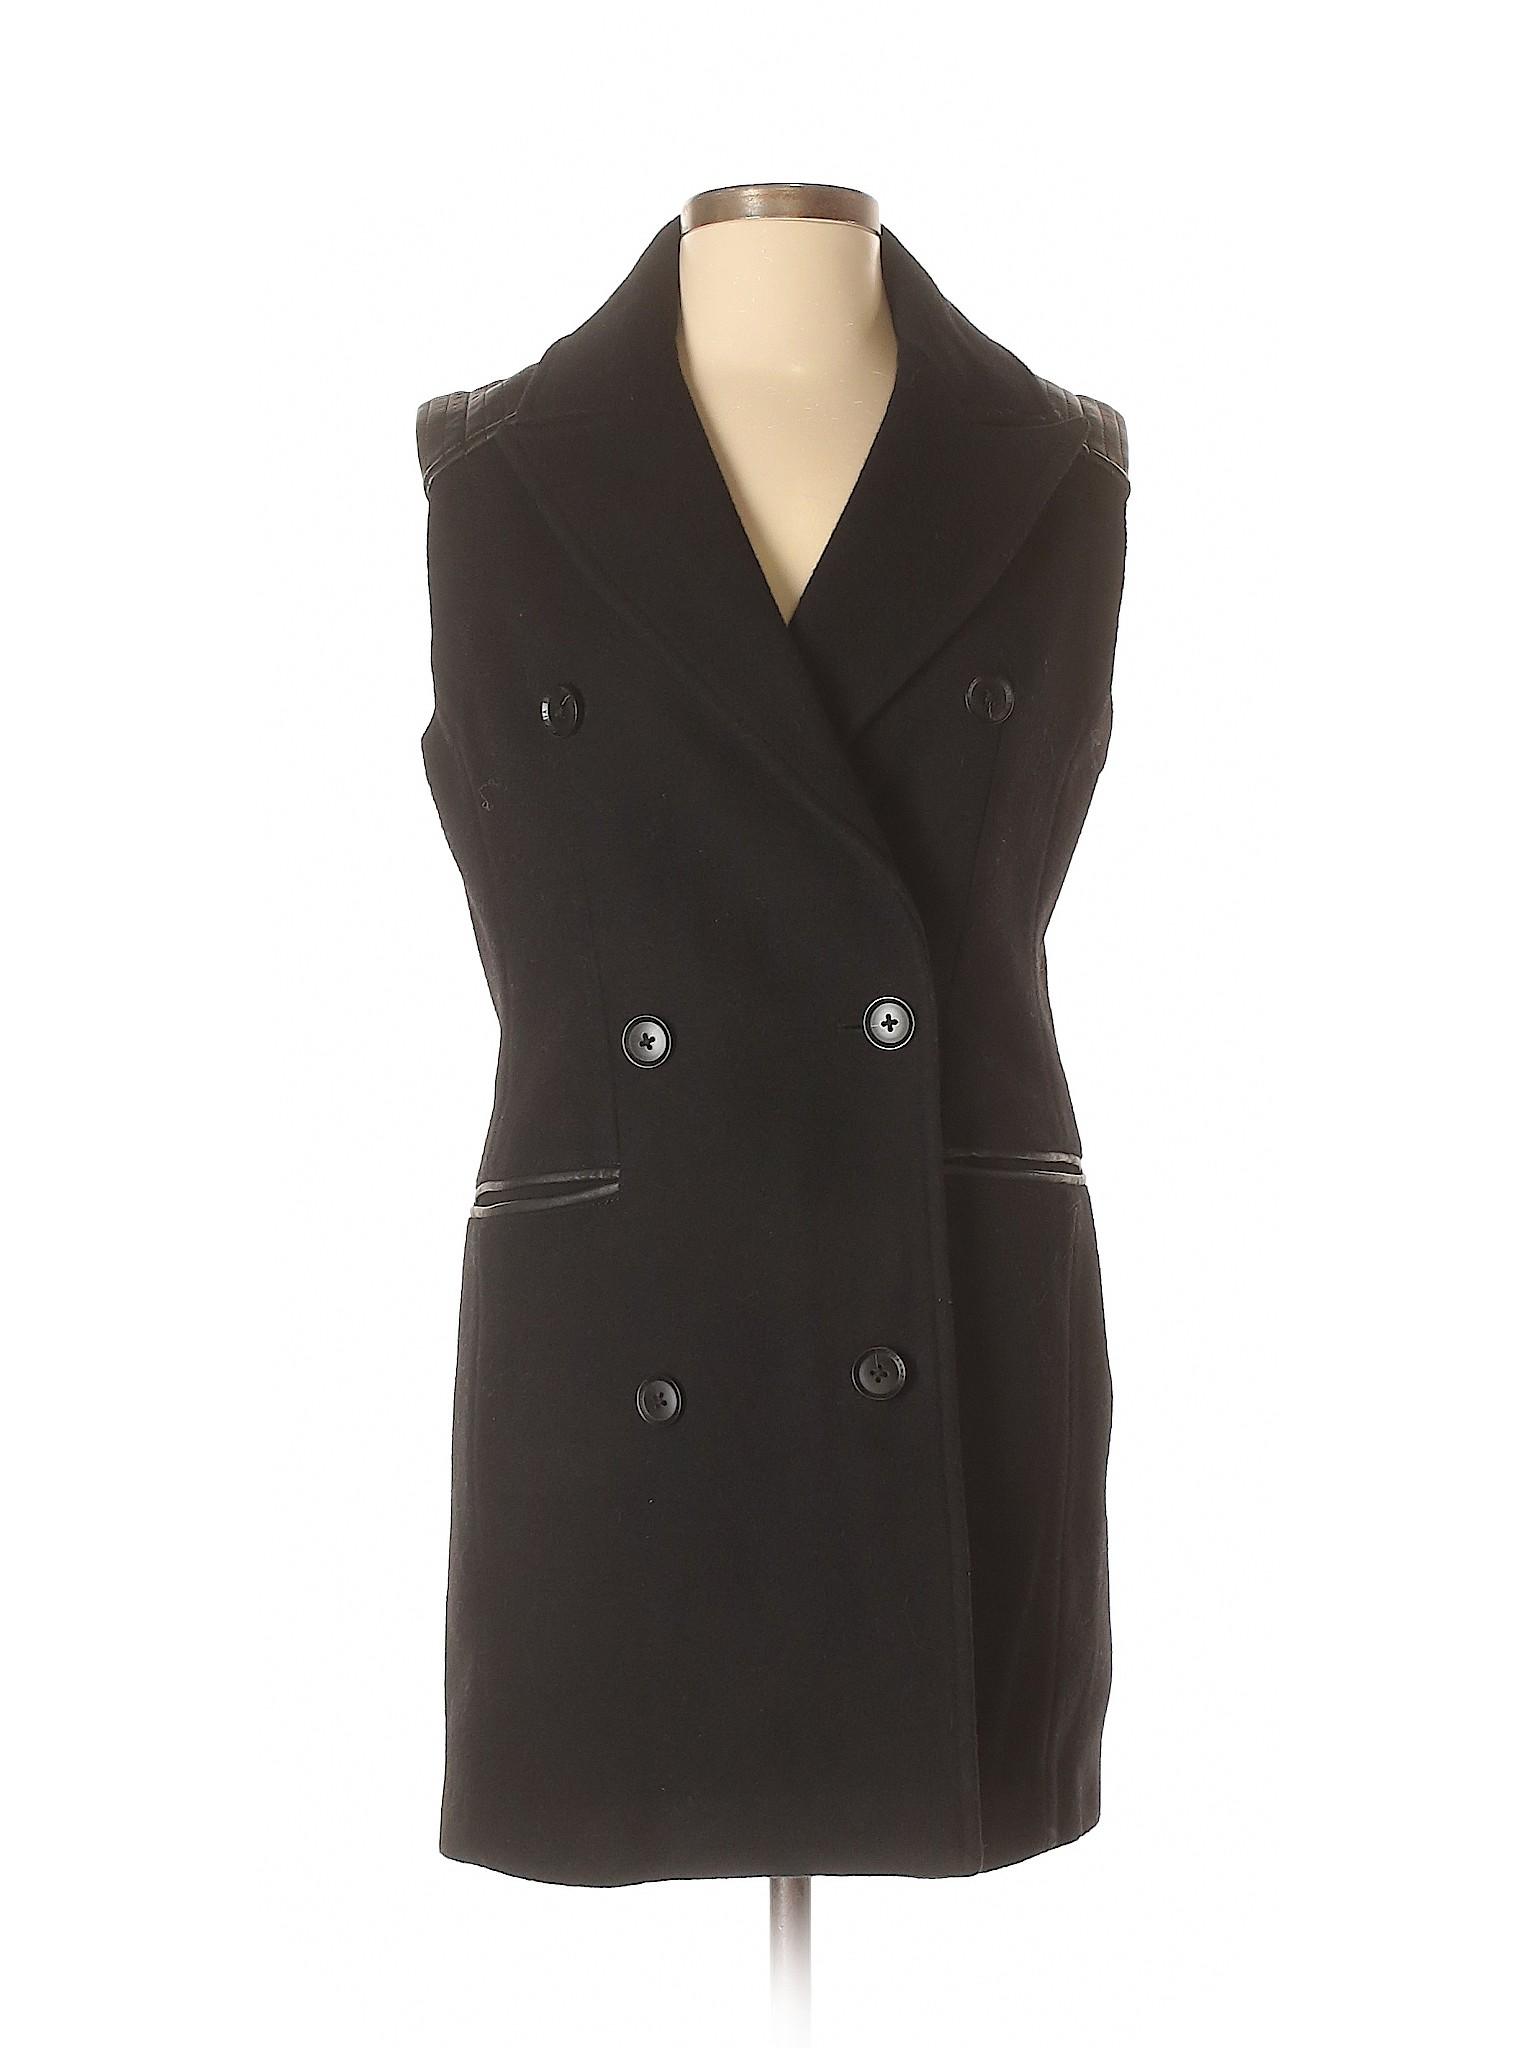 Wool Coat leisure leisure Boutique BCBGMAXAZRIA Boutique Fw7q1B81